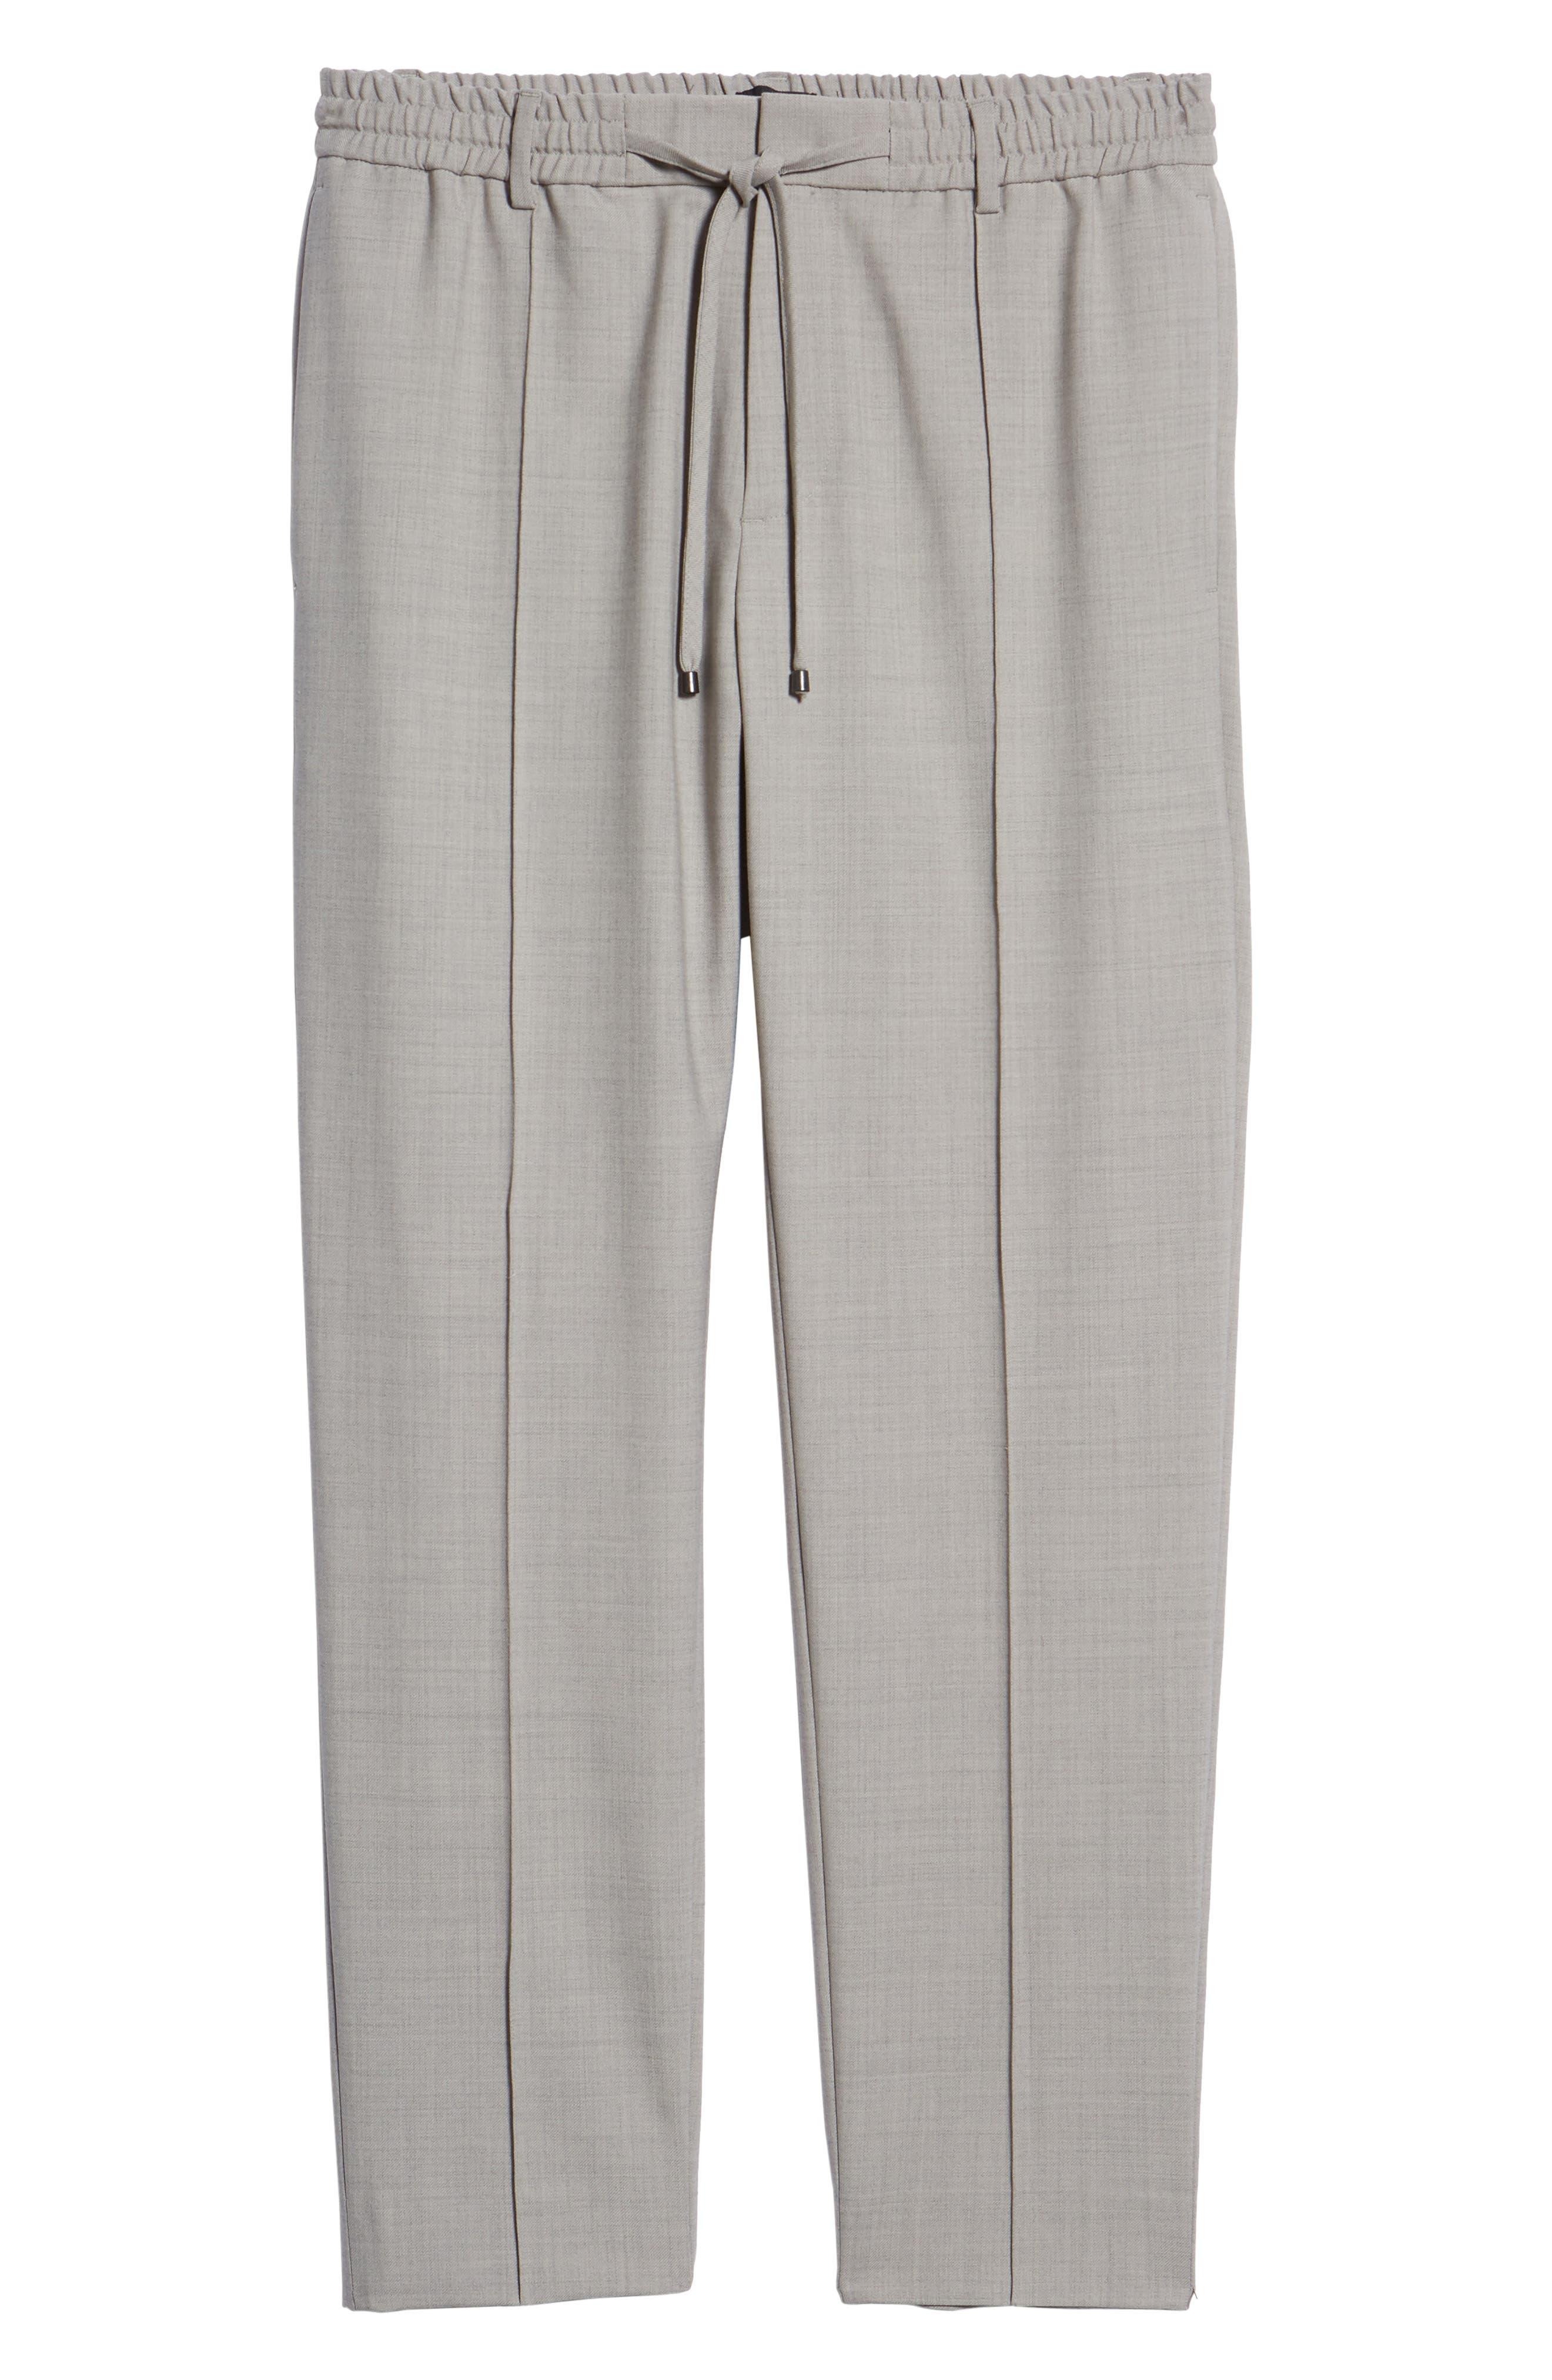 CLUB MONACO,                             Trim Fit Pintuck Pants,                             Alternate thumbnail 6, color,                             HEATHER GREY